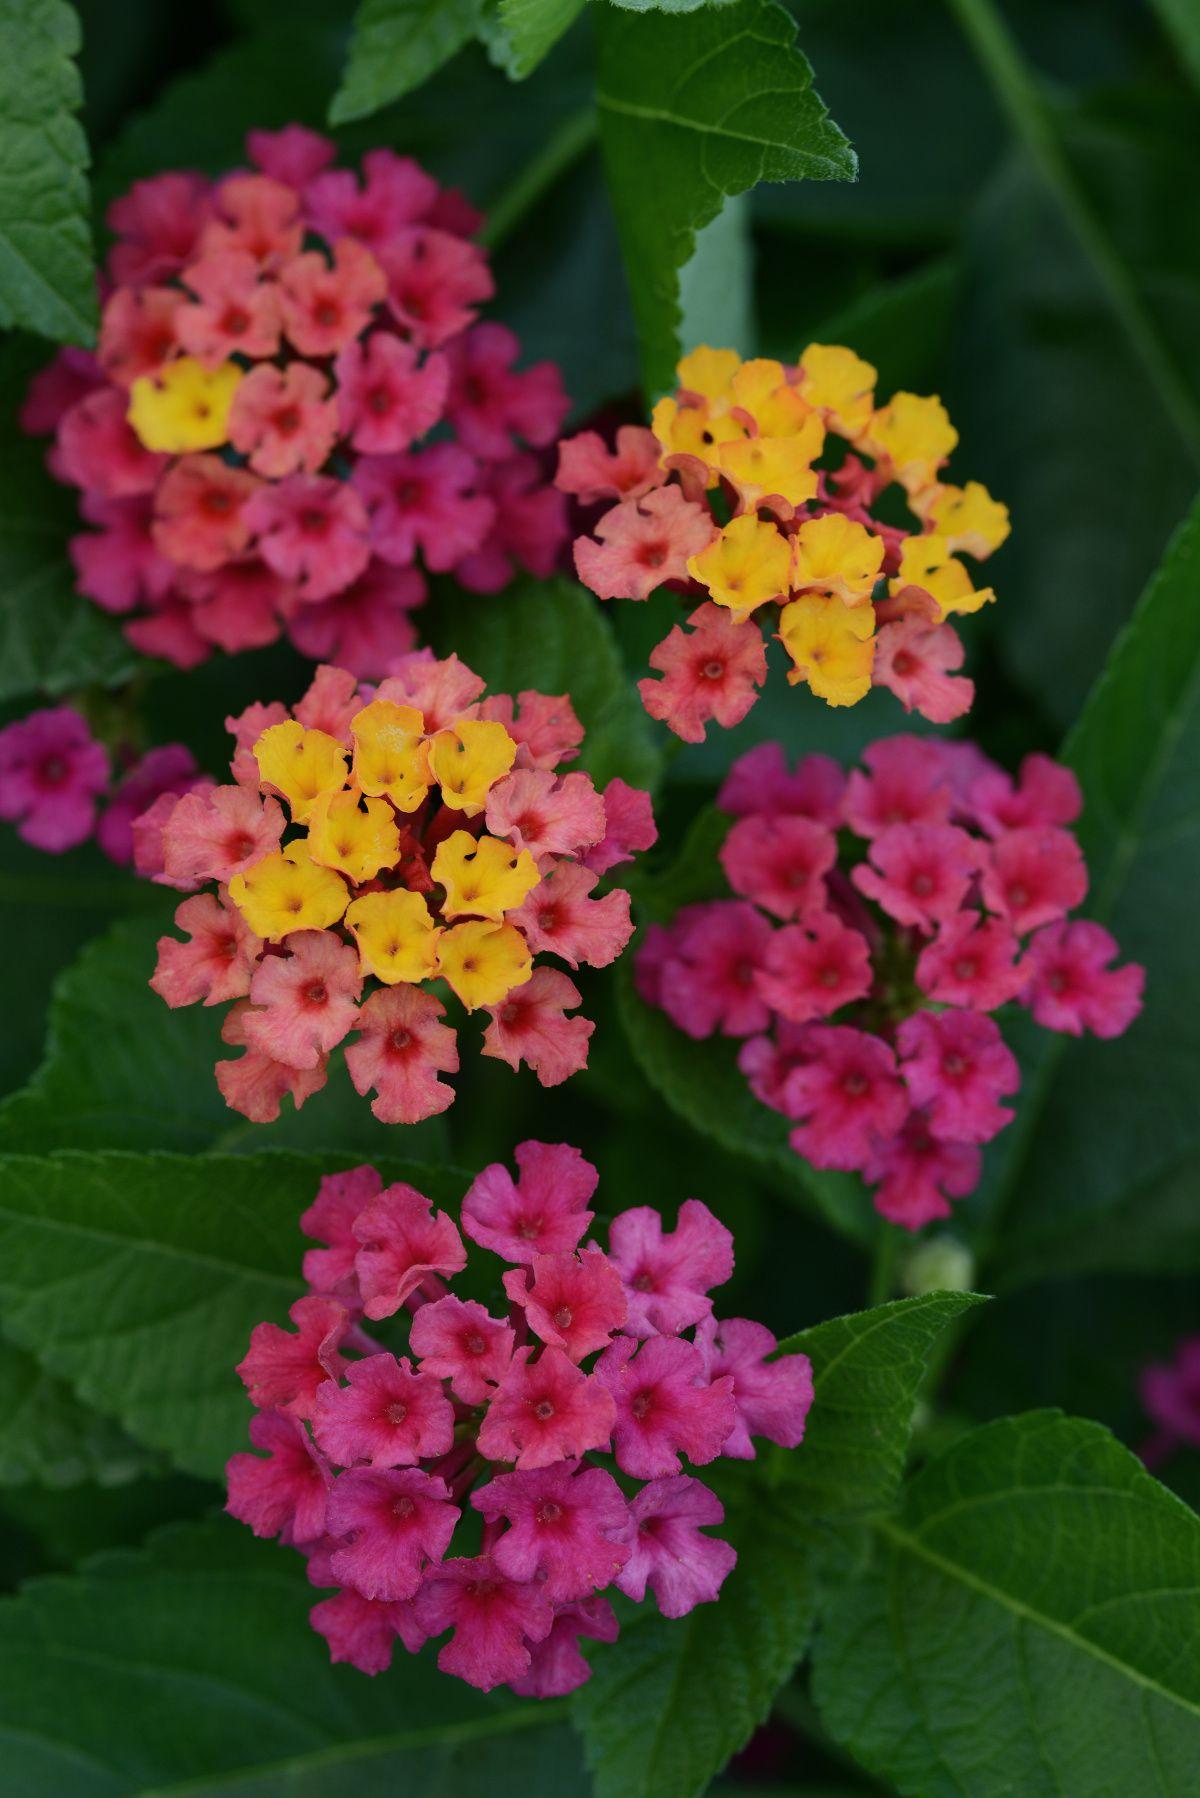 Lantana Pictures National Garden Bureau In 2020 Lantana Flower Garden Plants Pollinator Garden